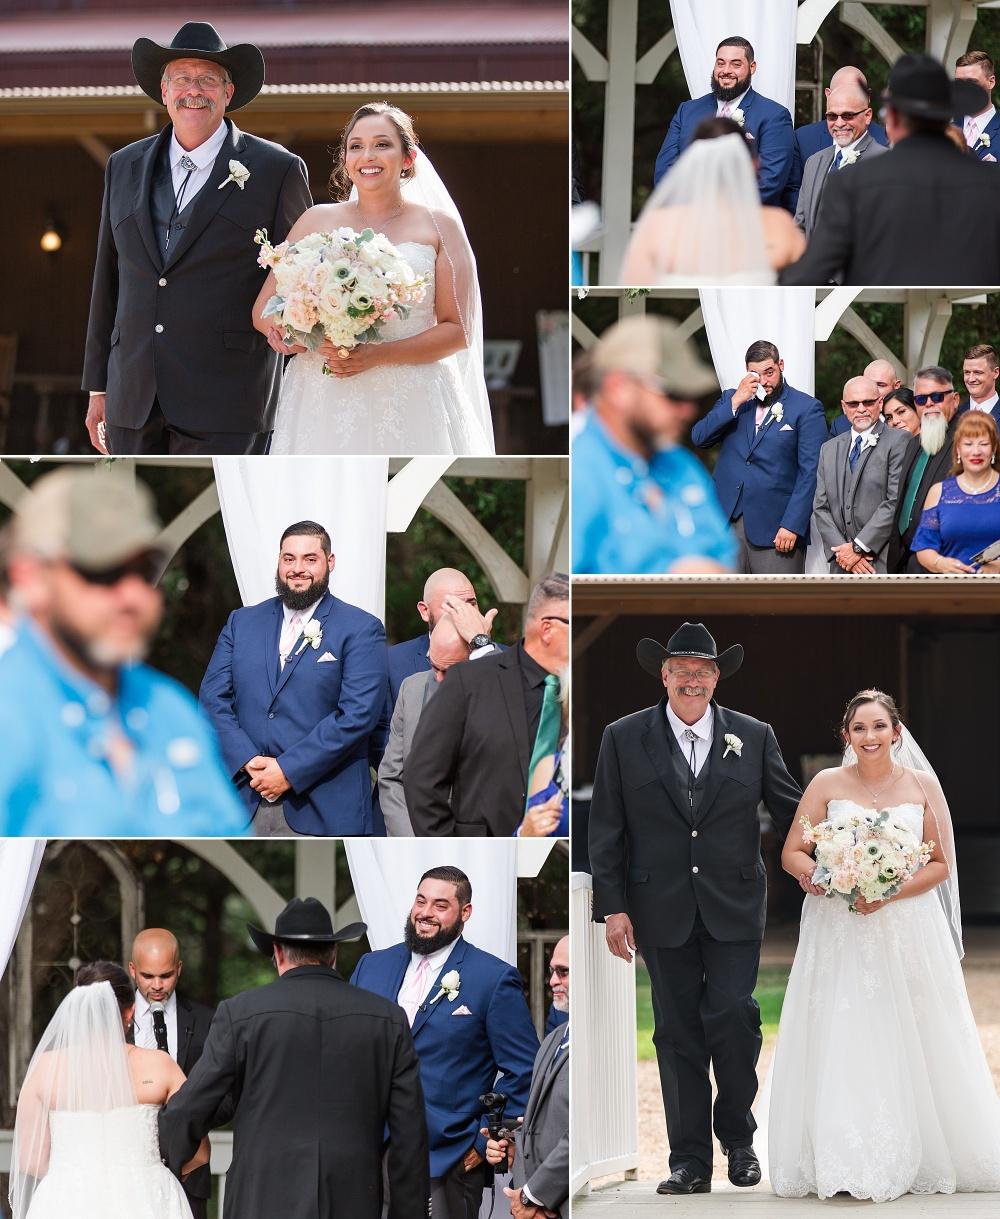 Wedding-Photographer-Bulverde-Texas-Western-Sky-Event-Venue-Carly-Barton-Photography_0040.jpg